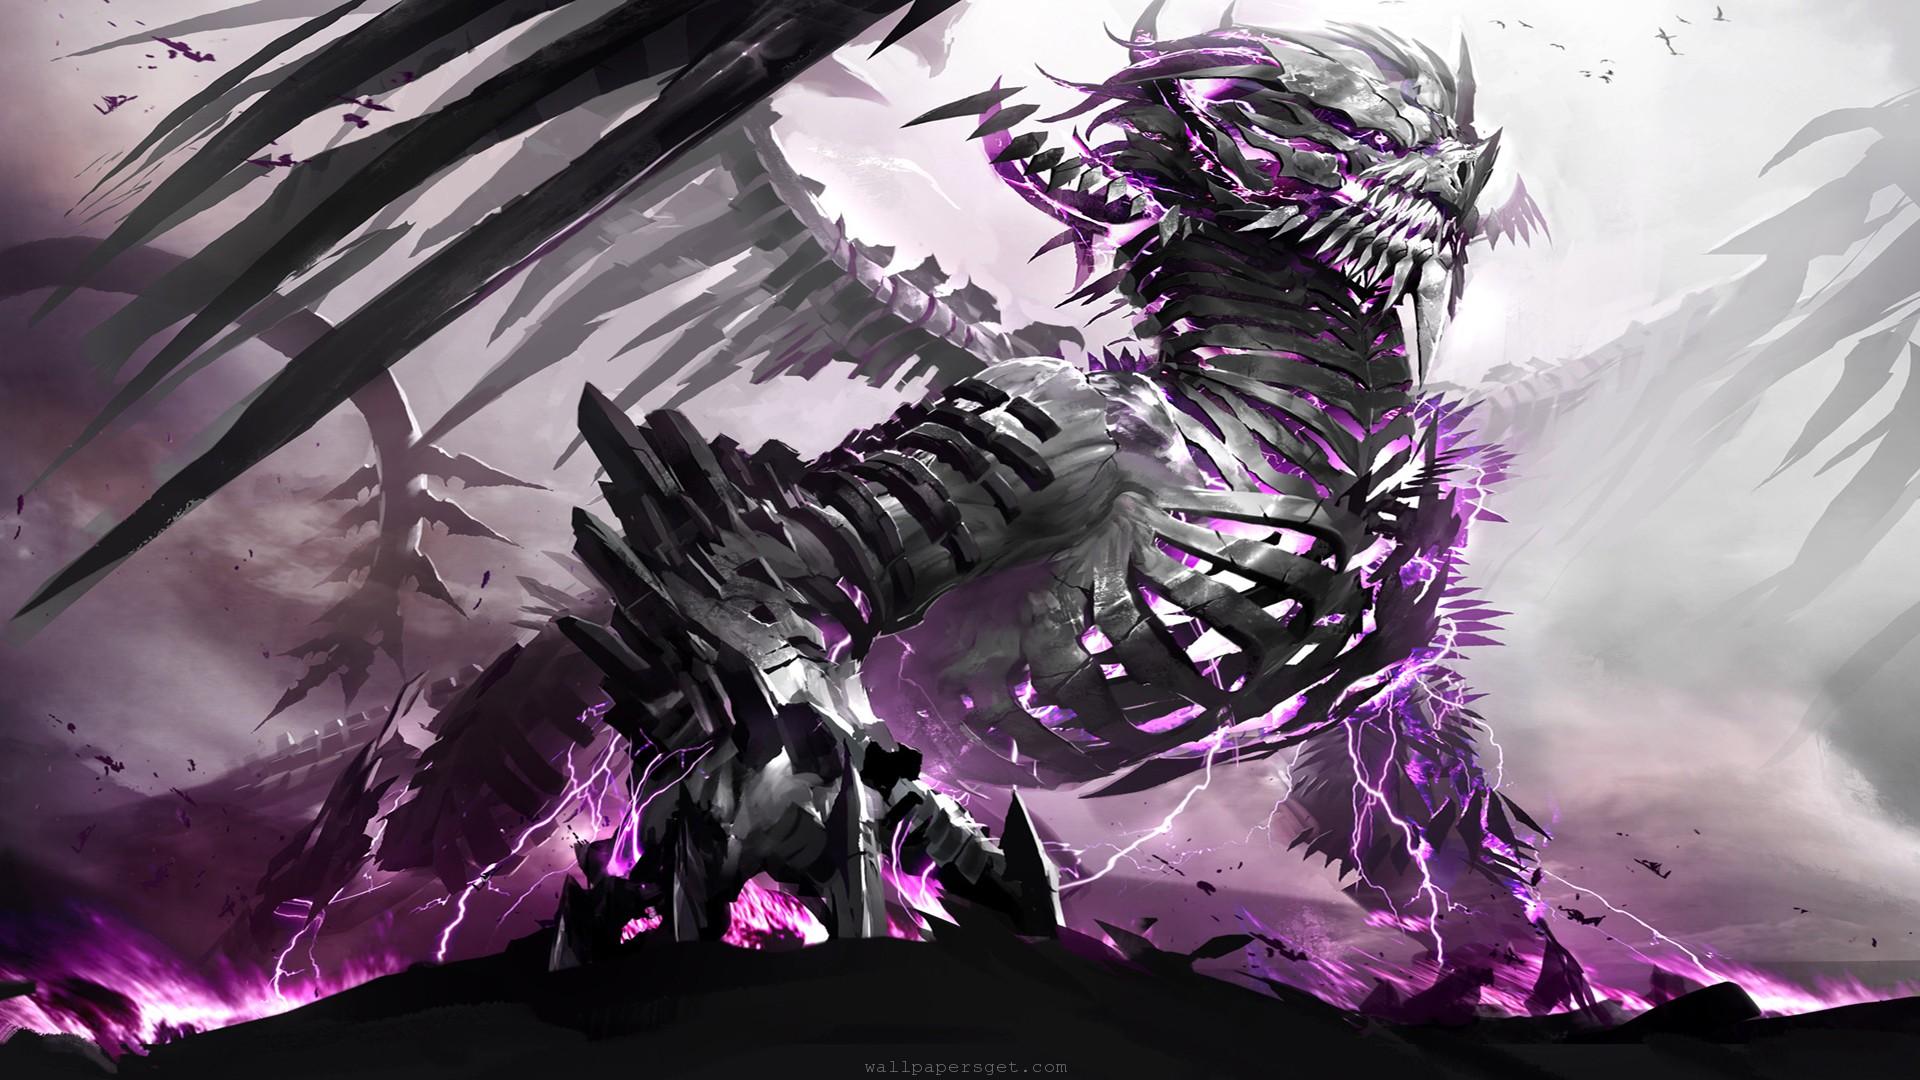 Purple Dragon HD Desktop Wallpaper HD Desktop Wallpaper 1920x1080